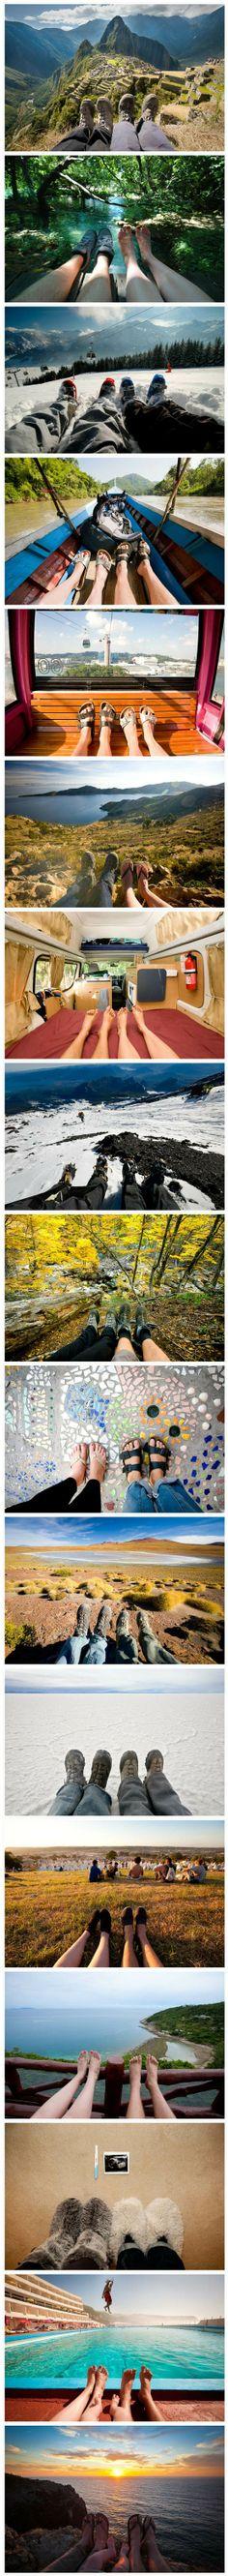 traveling feet